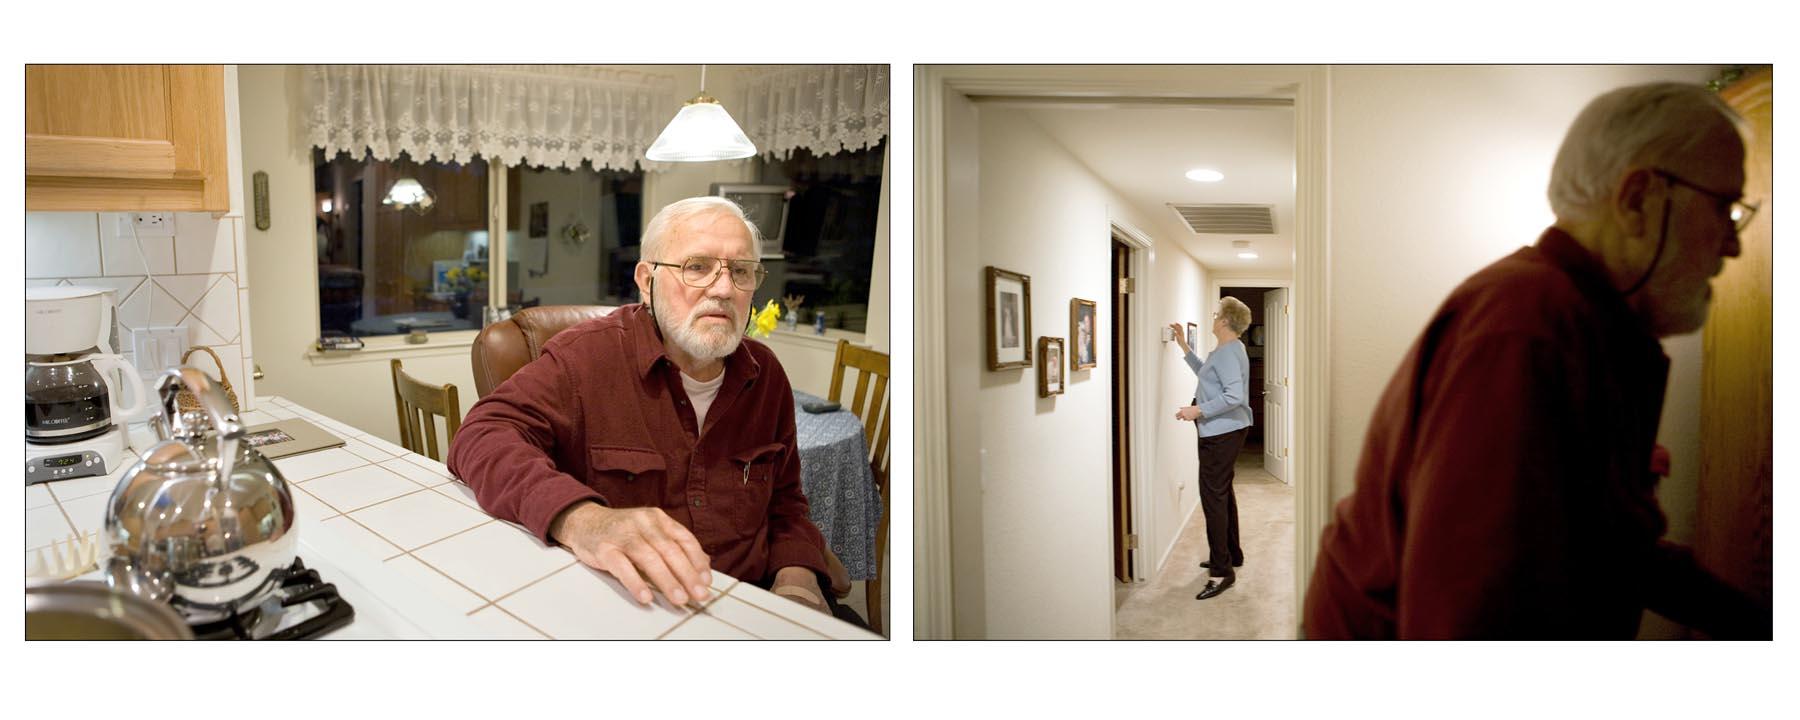 New diagnosis of Mild Cognitive Impairment.Nevada City, CA